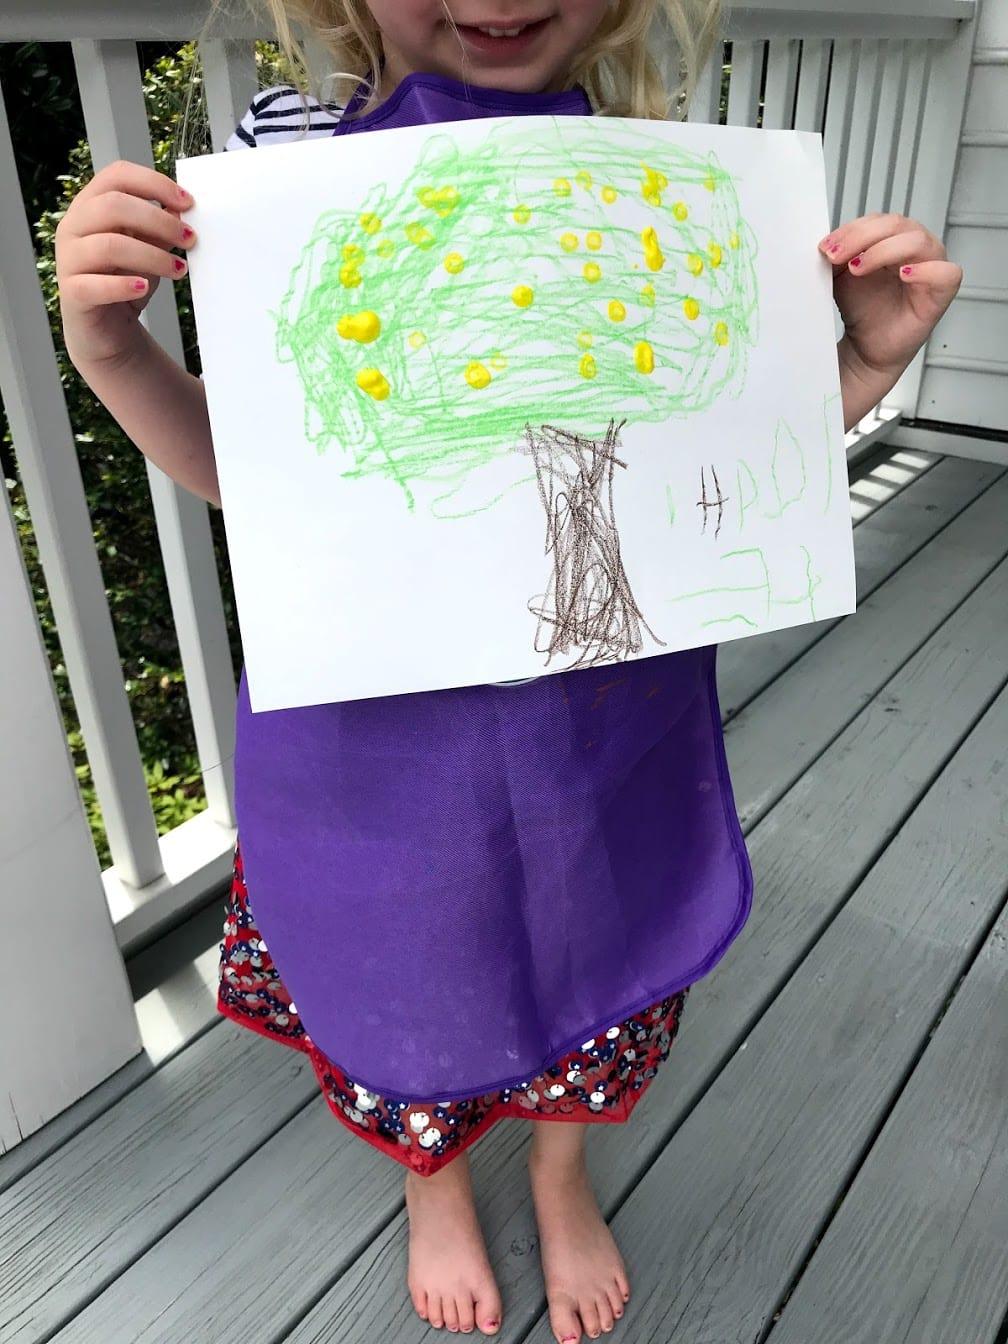 Childs holding Grapefruit tree